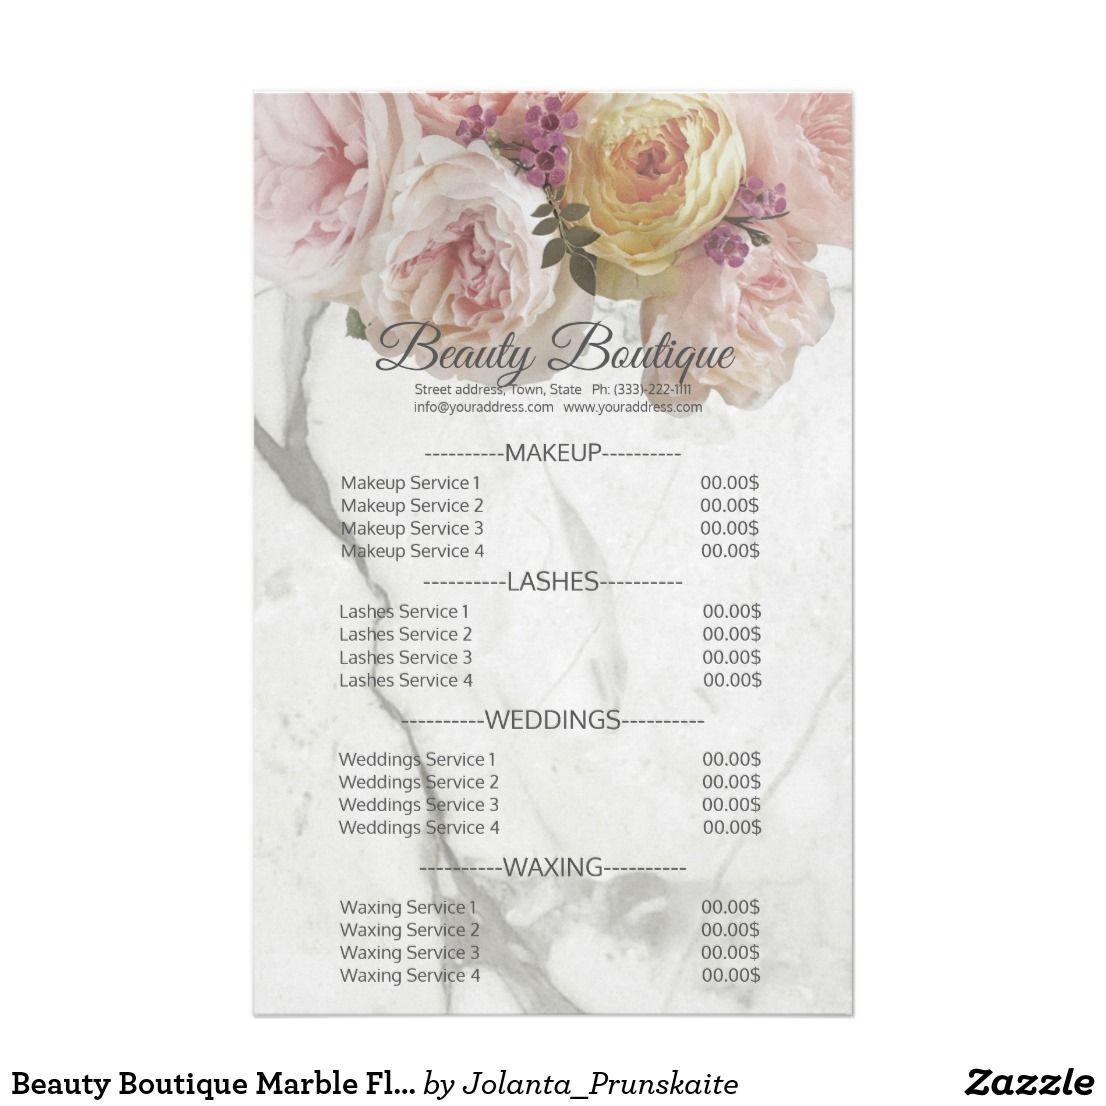 Beauty Boutique Marble Flower Price List Flyer Zazzle Com Beauty Boutique Flyer Waxing Services